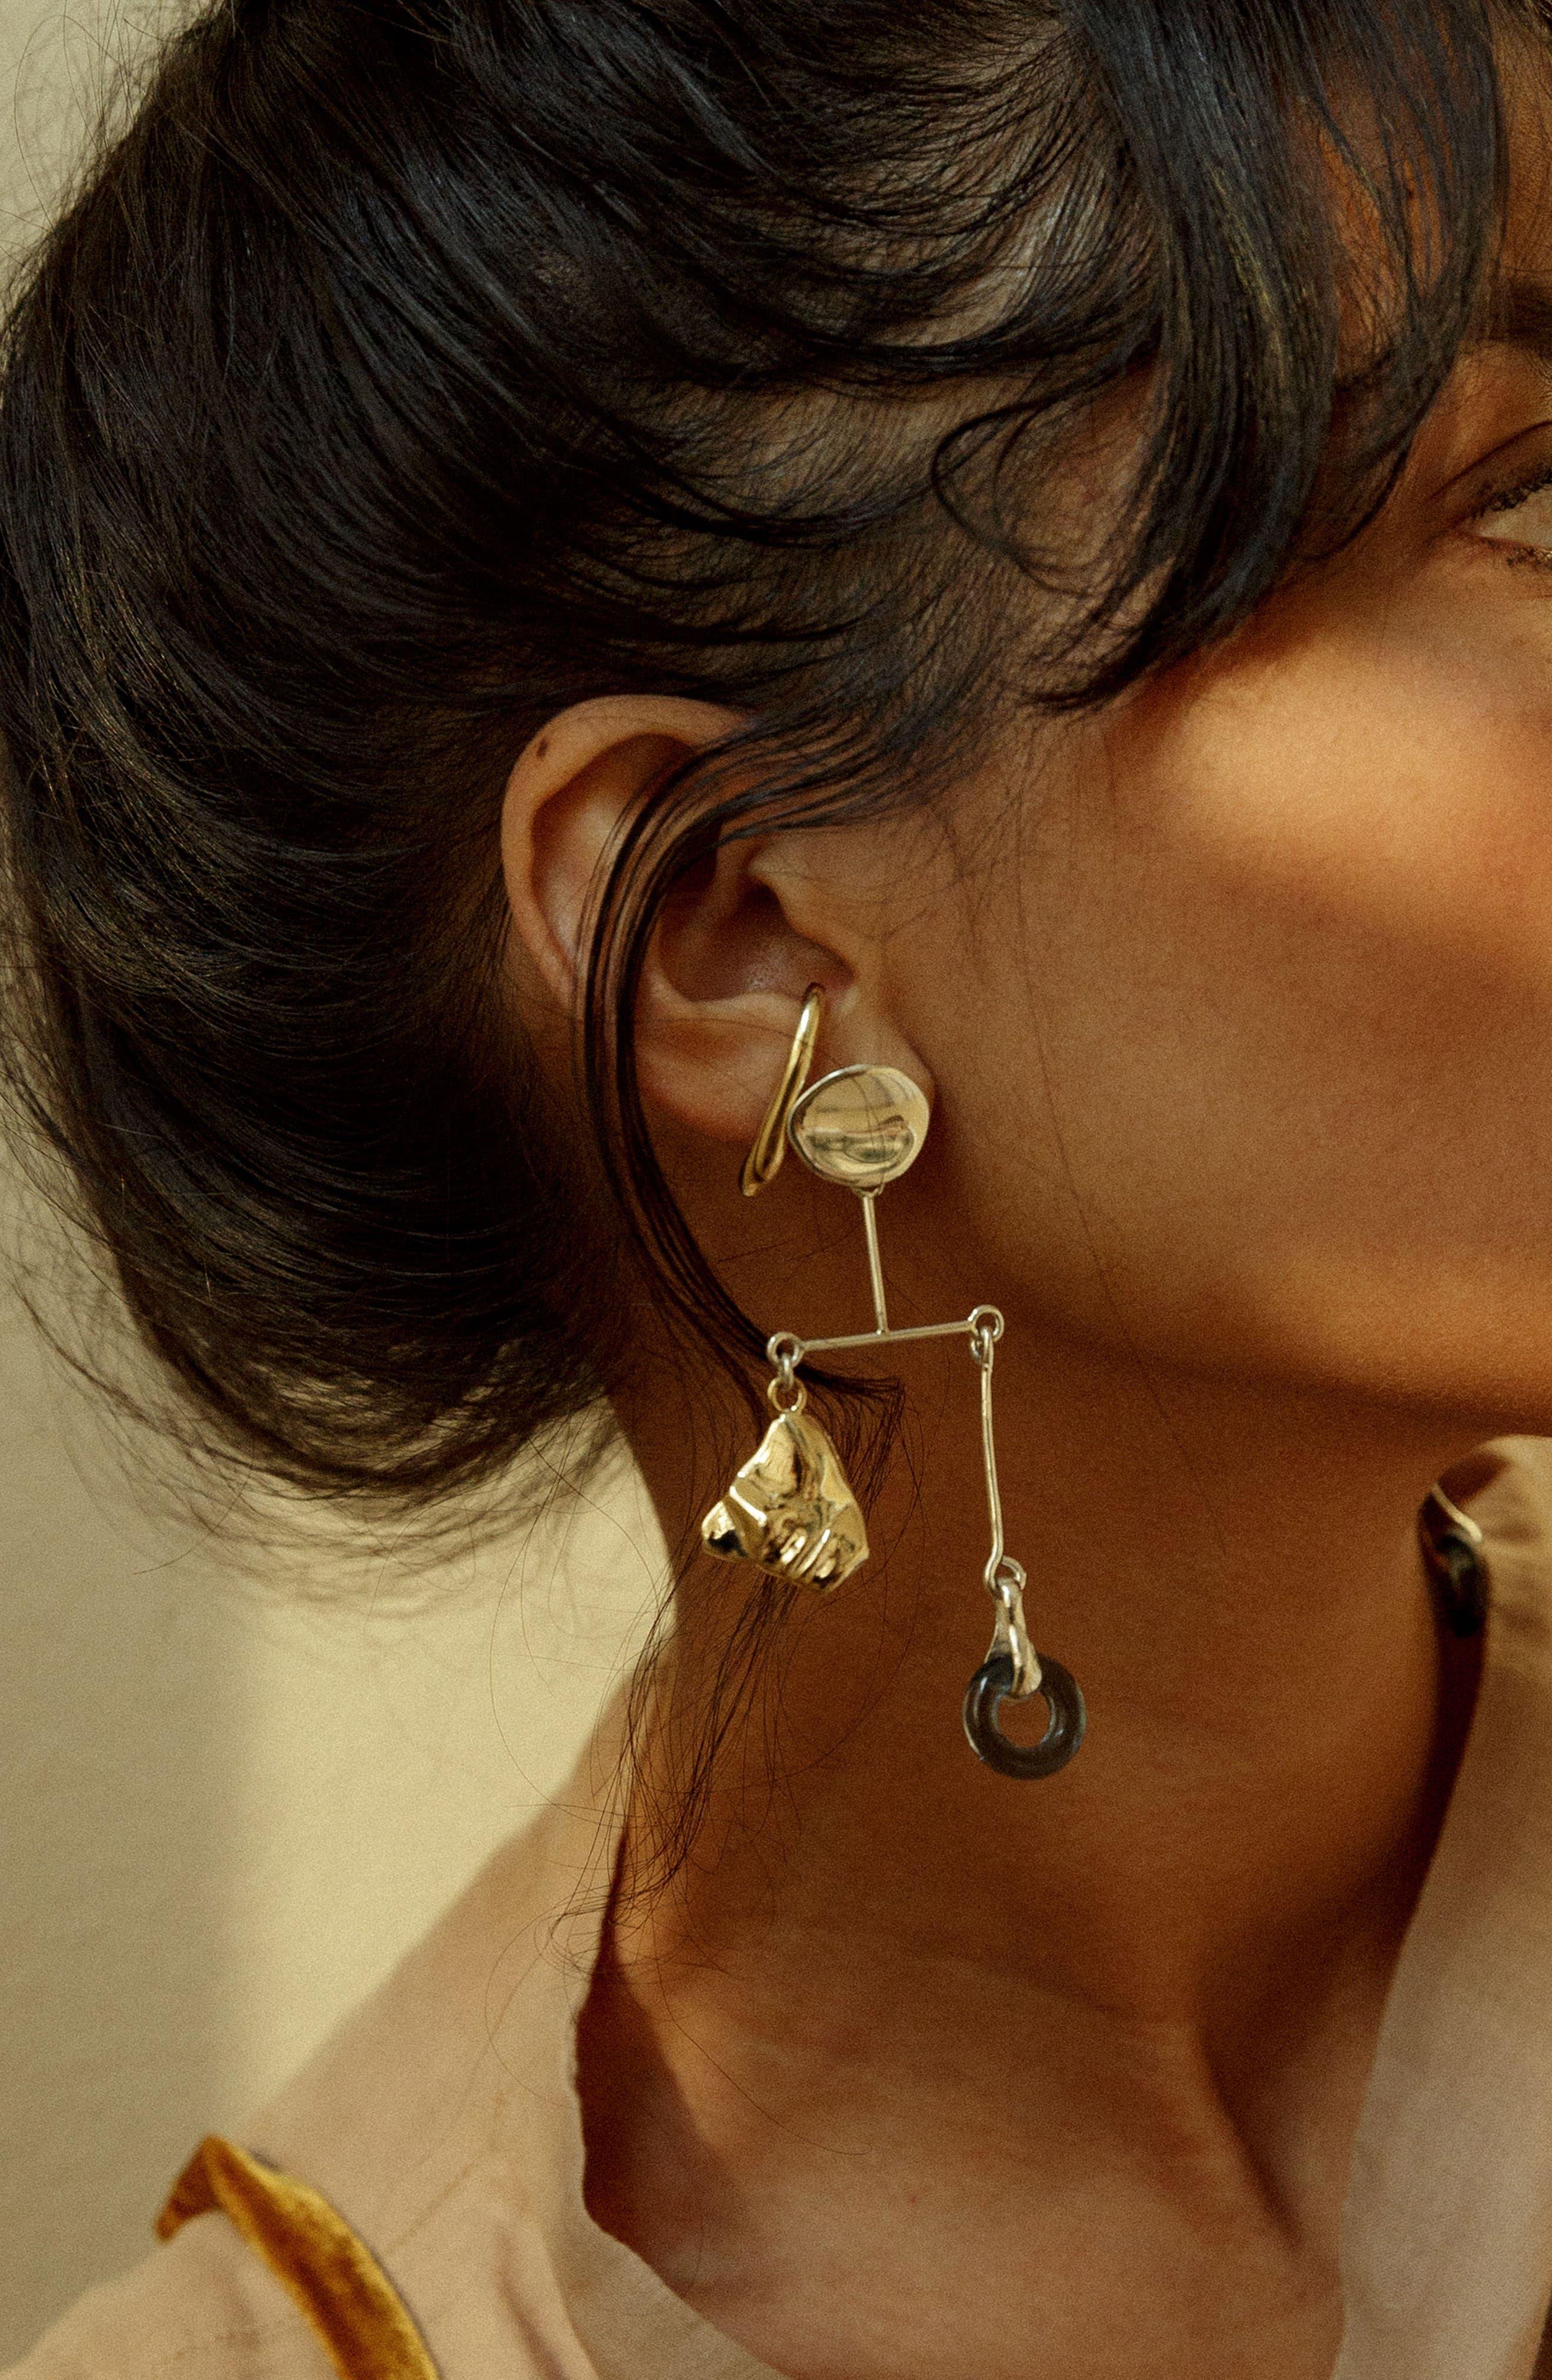 Portra Mobile Earrings,                             Alternate thumbnail 3, color,                             STERLING SILVER/ BRONZE/ GLASS